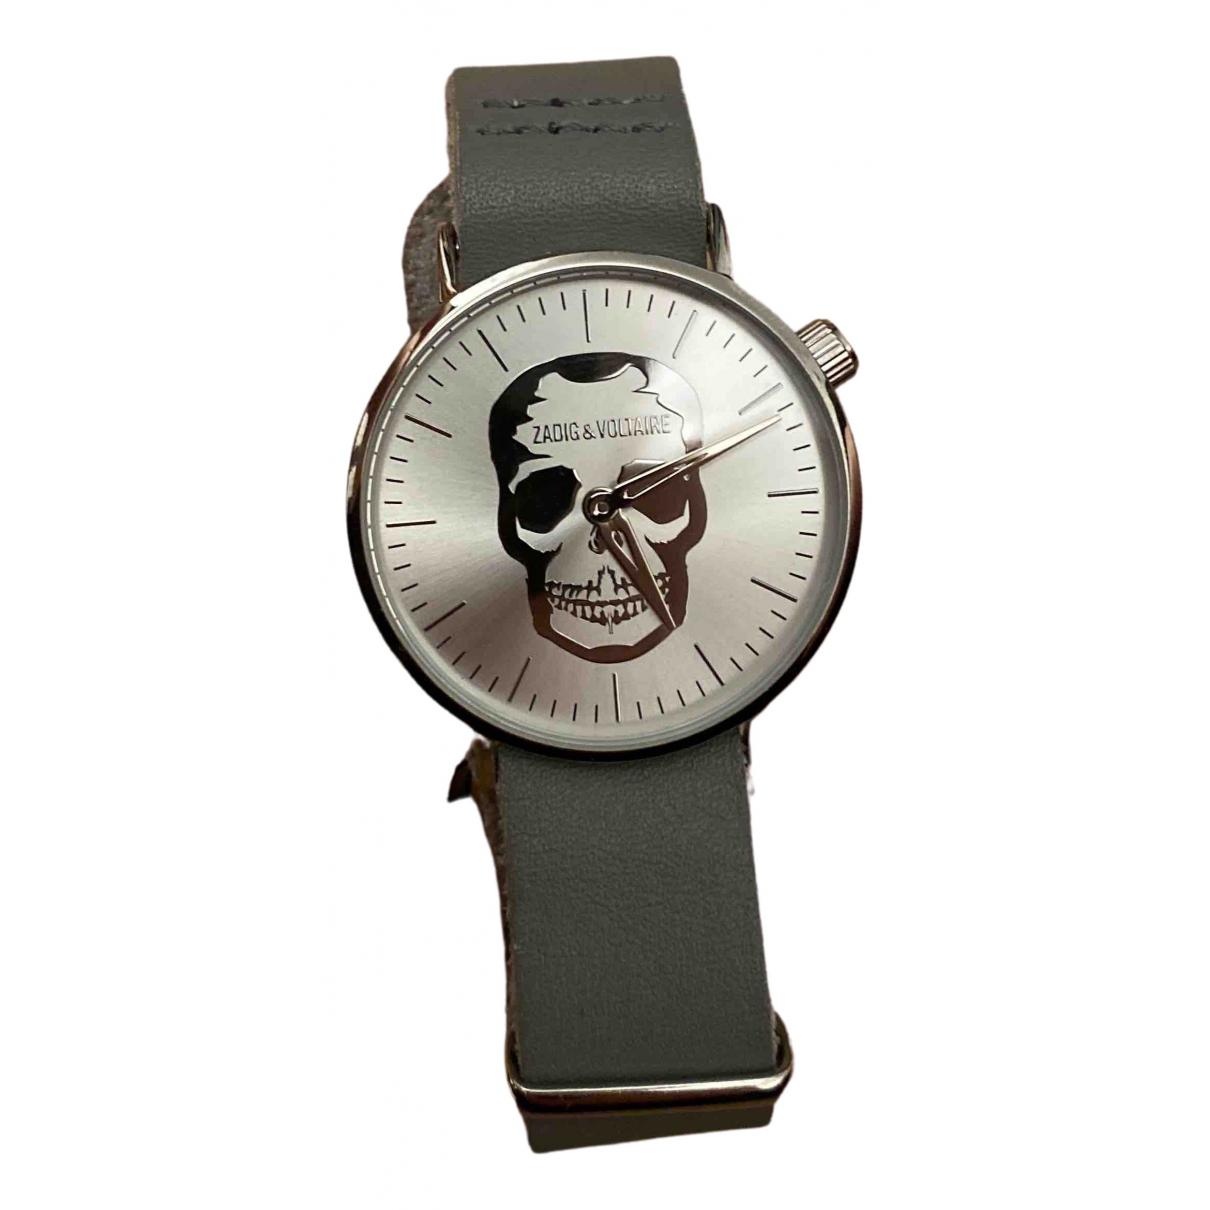 Zadig & Voltaire Papillon Uhr in  Grau Stahl